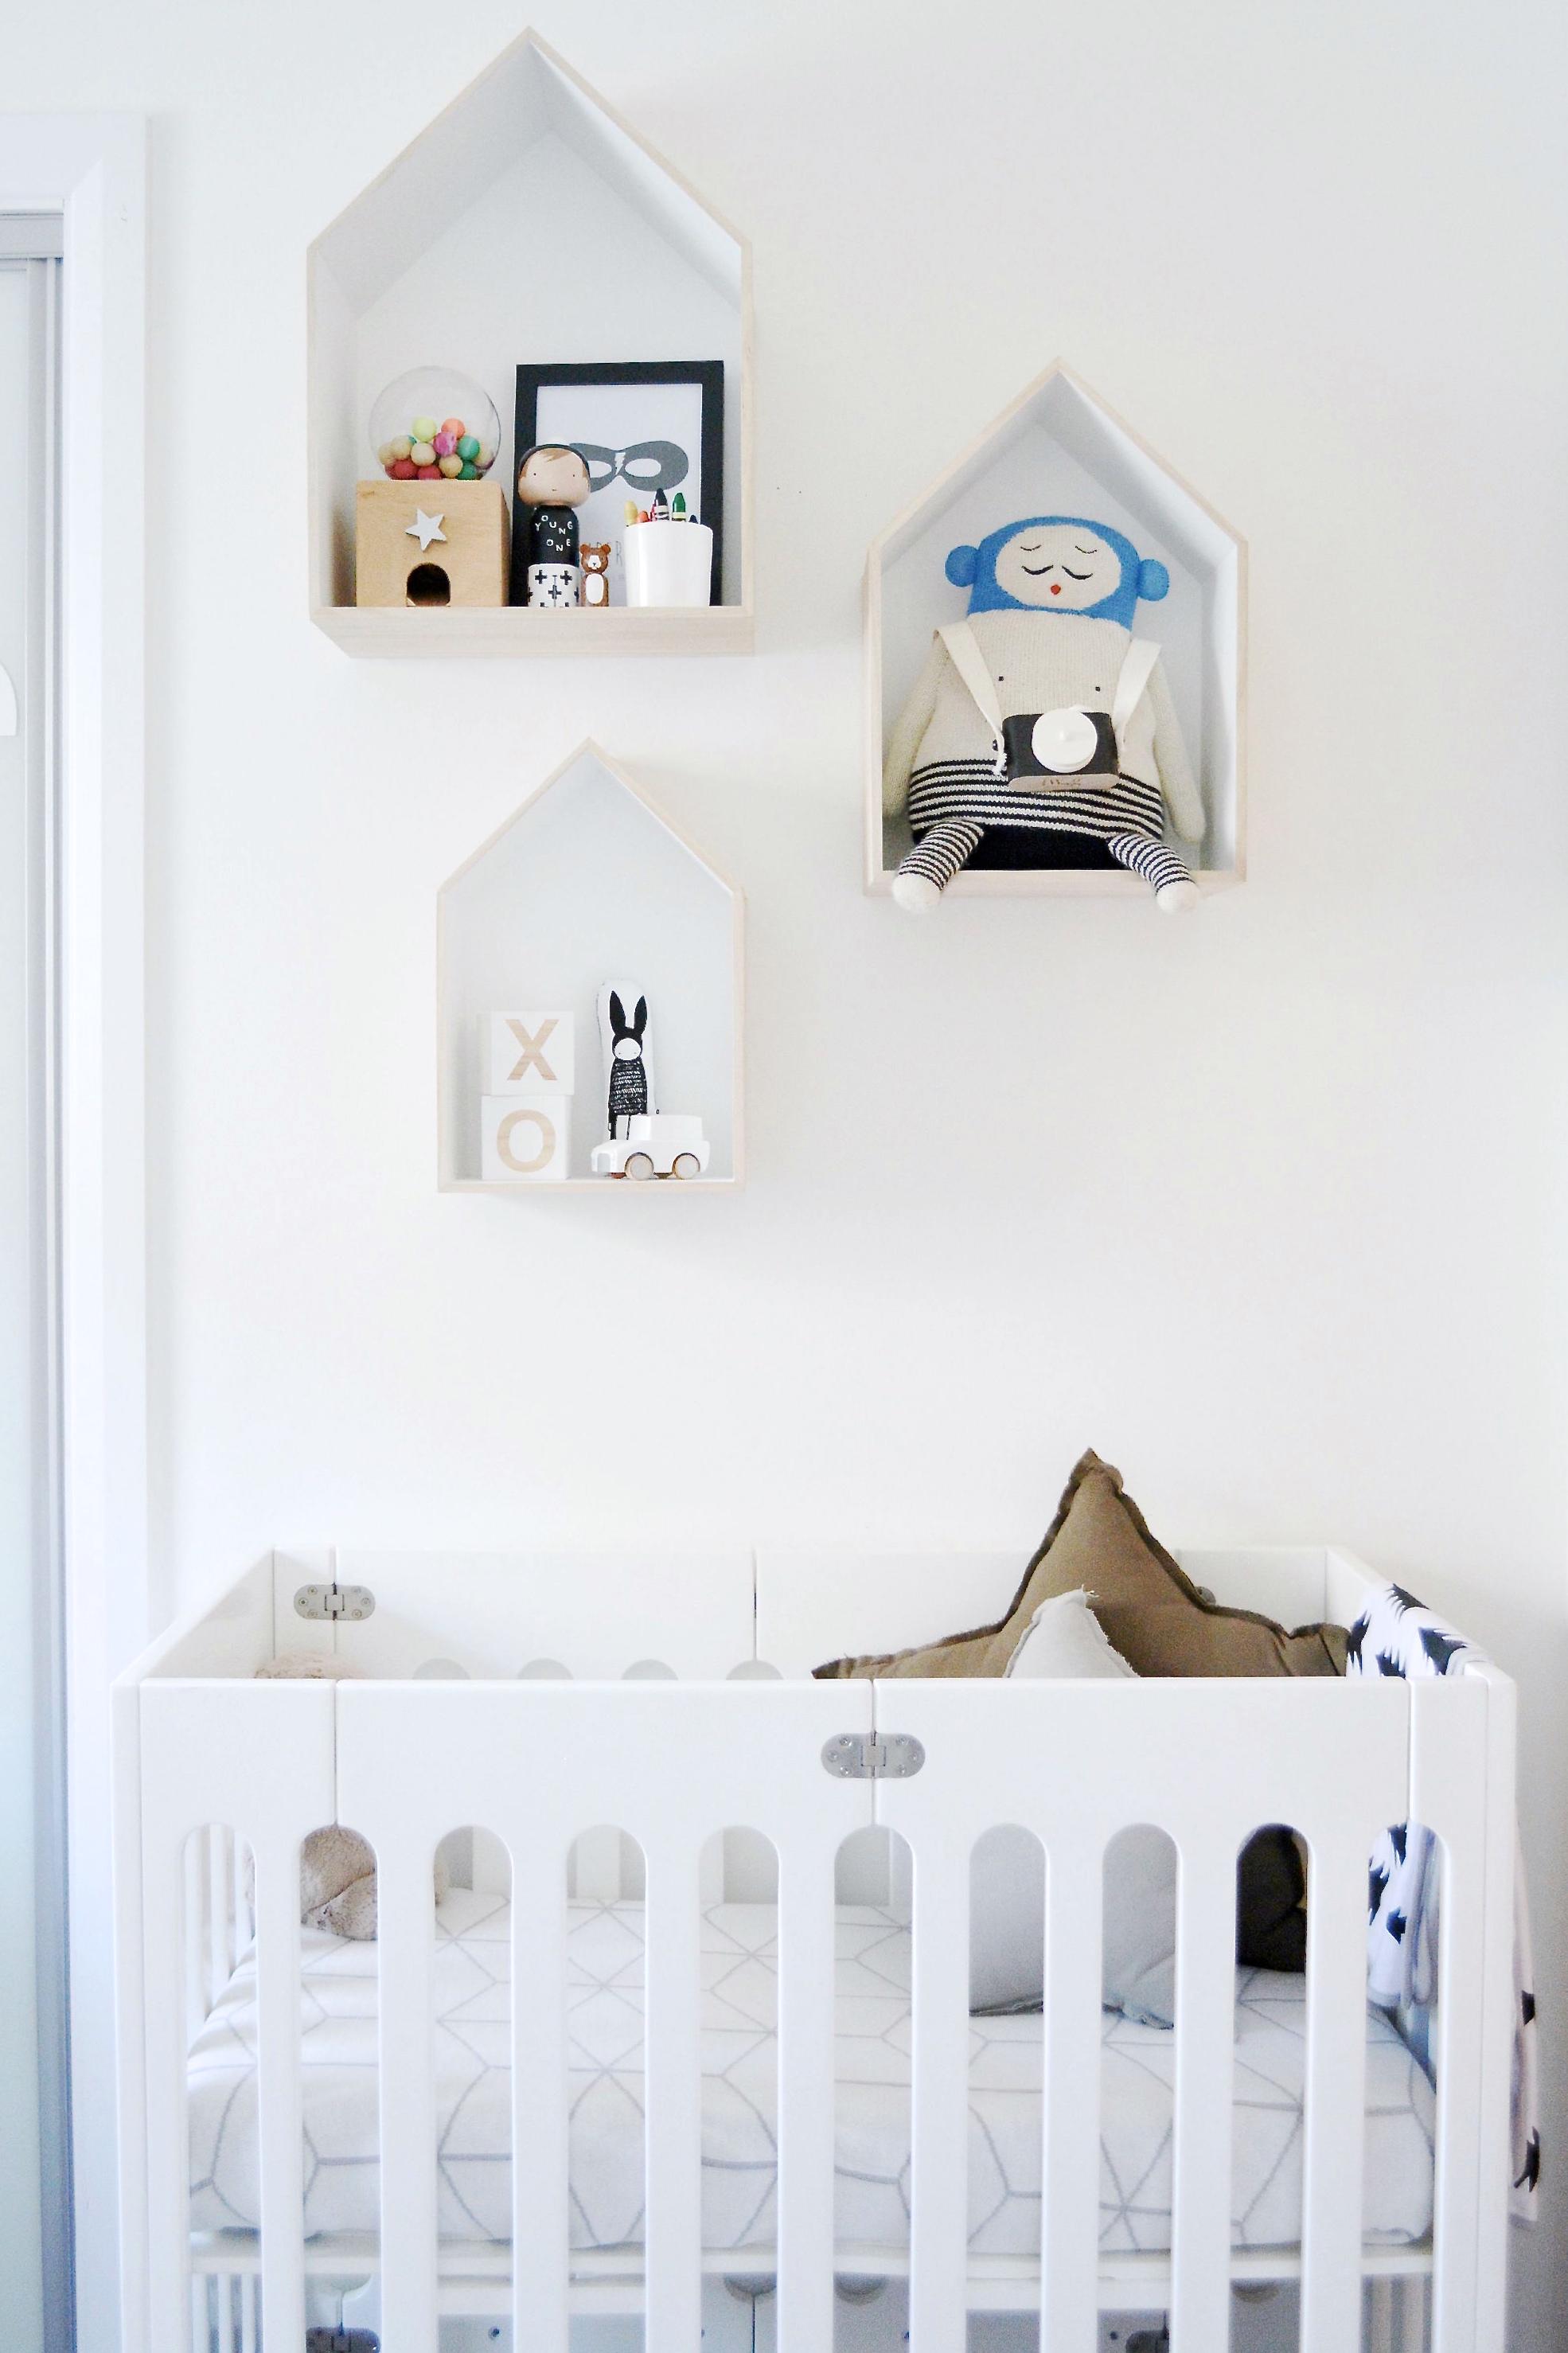 6c3420021e7 Πώς μετατρέπουμε το βρεφικό δωμάτιο σε παιδικό! - Baby & kids shop ...